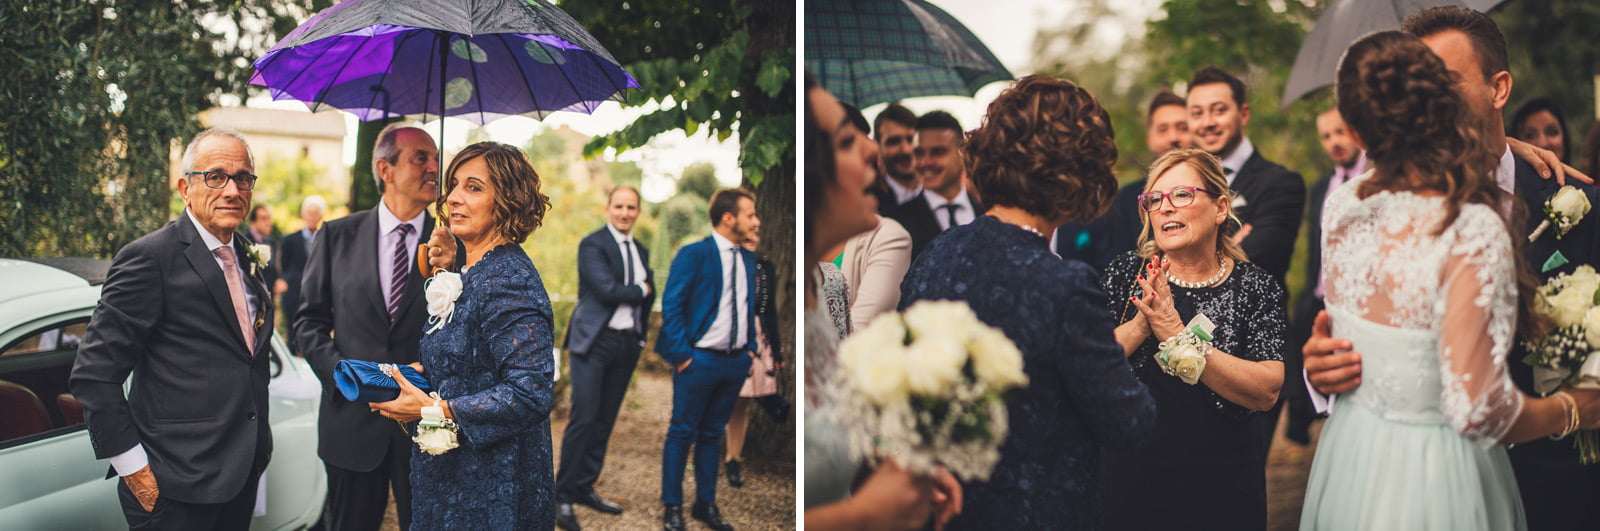 026-wedding-florence-palazzo-borghese